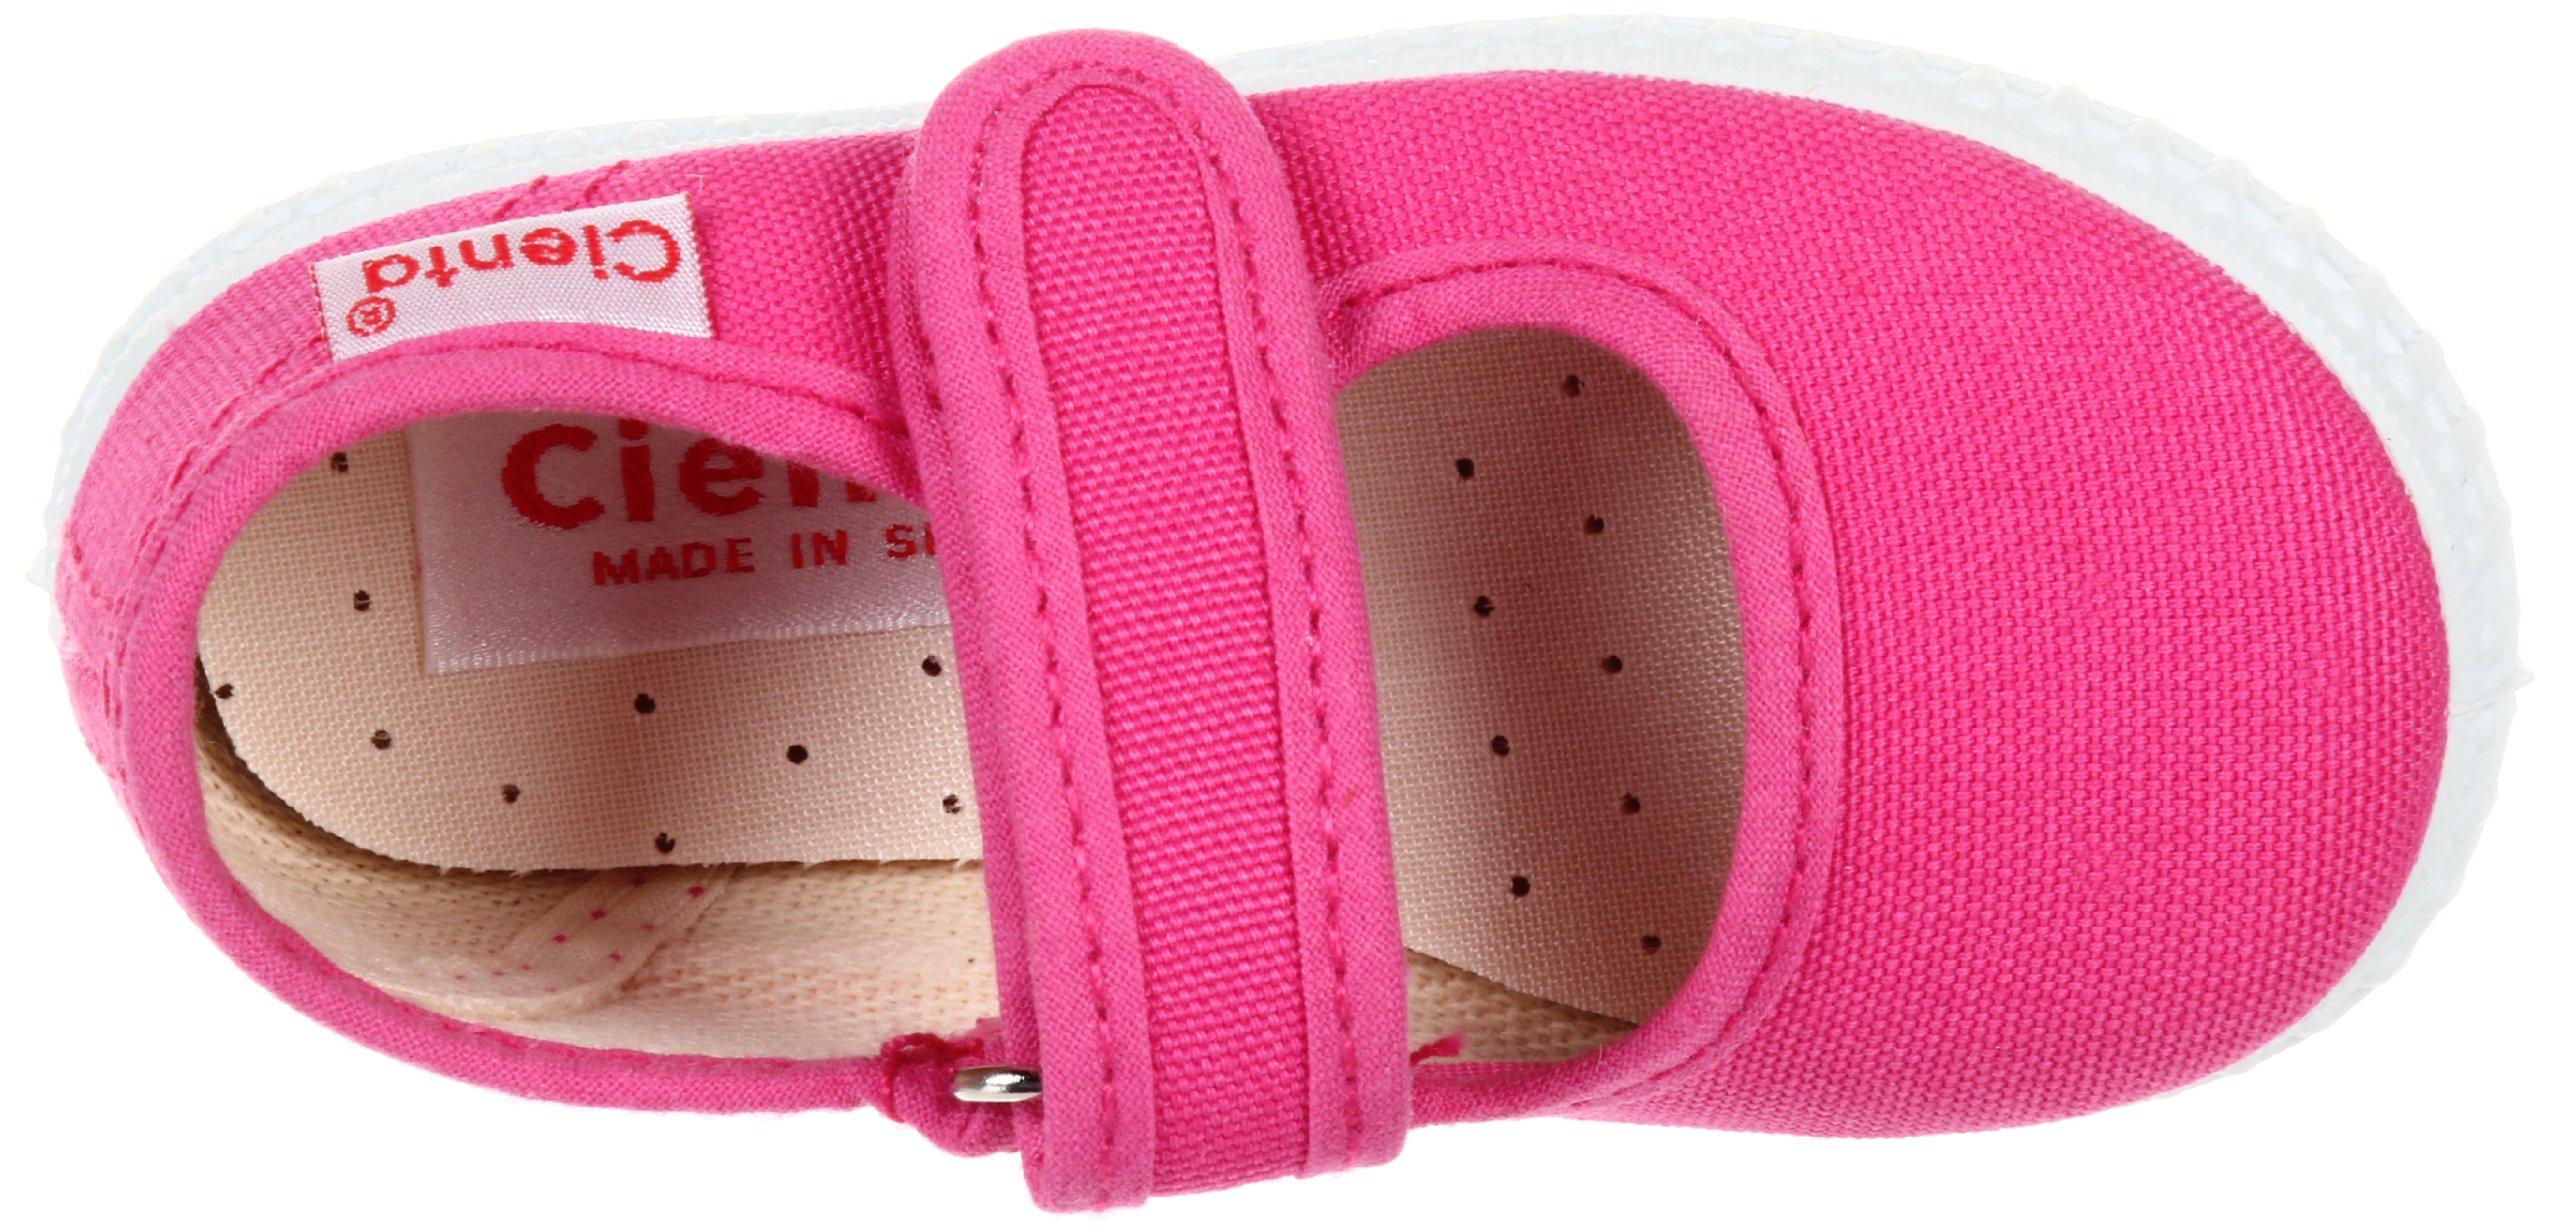 Cienta Girls Mary Jane Shoe, Fuchsia, 19 M EU / 3.5 M US Toddler by Cienta (Image #7)